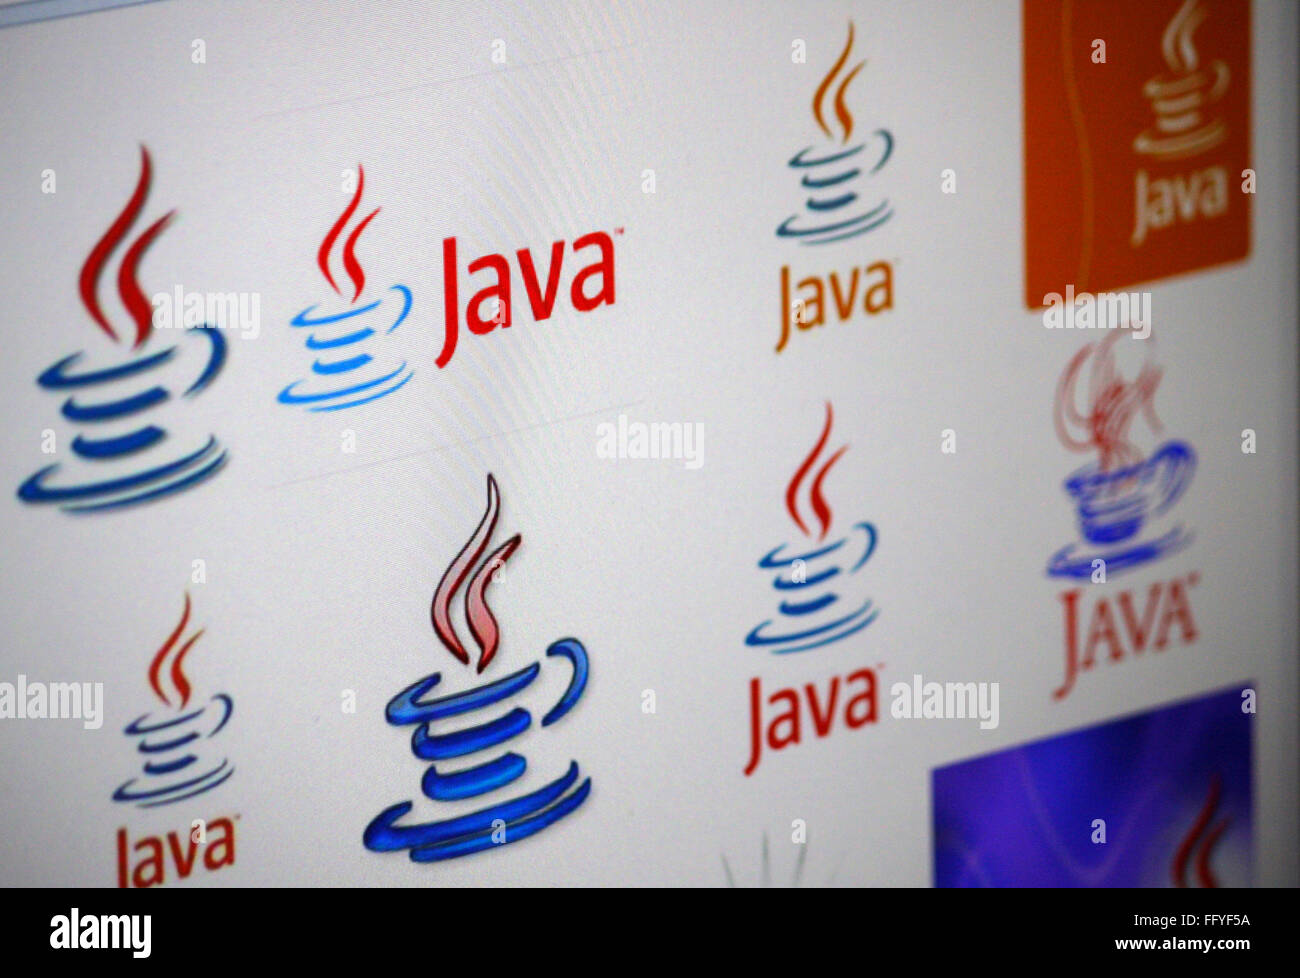 Markenname: 'Java'. - Stock Image